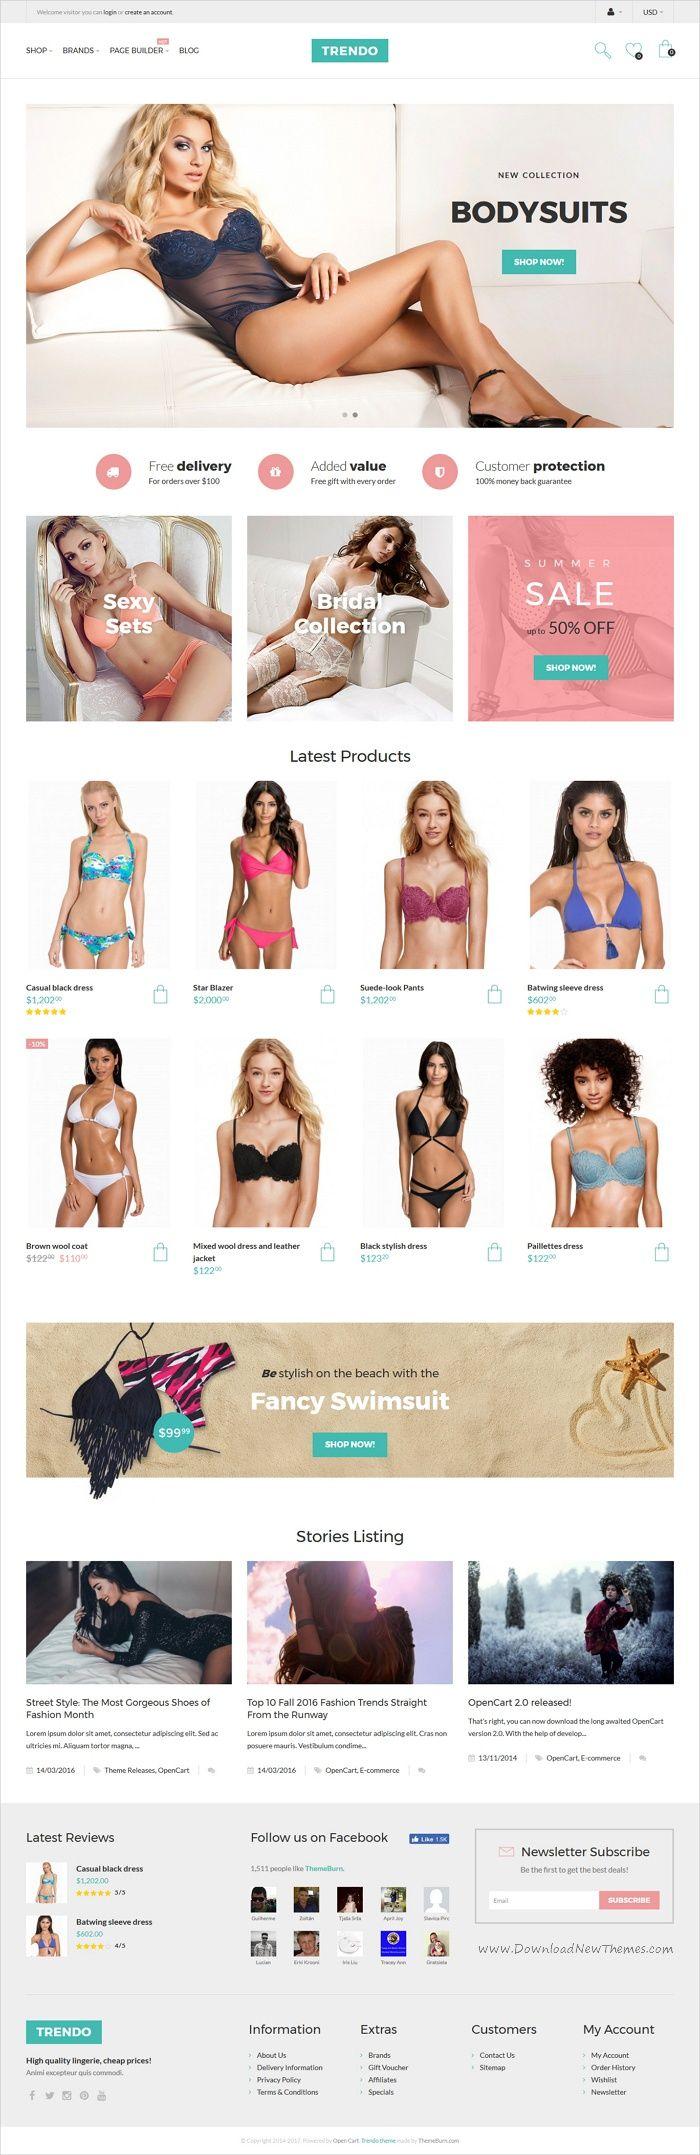 Trendo is a modern design 3in1 minimalist #Opencart theme for #bodysuits #beachwear #lingerie store stunning eCommerce websites download now➩ https://themeforest.net/item/trendo-minimalistic-fashion-store-opencart-theme/18254877?ref=Datasata